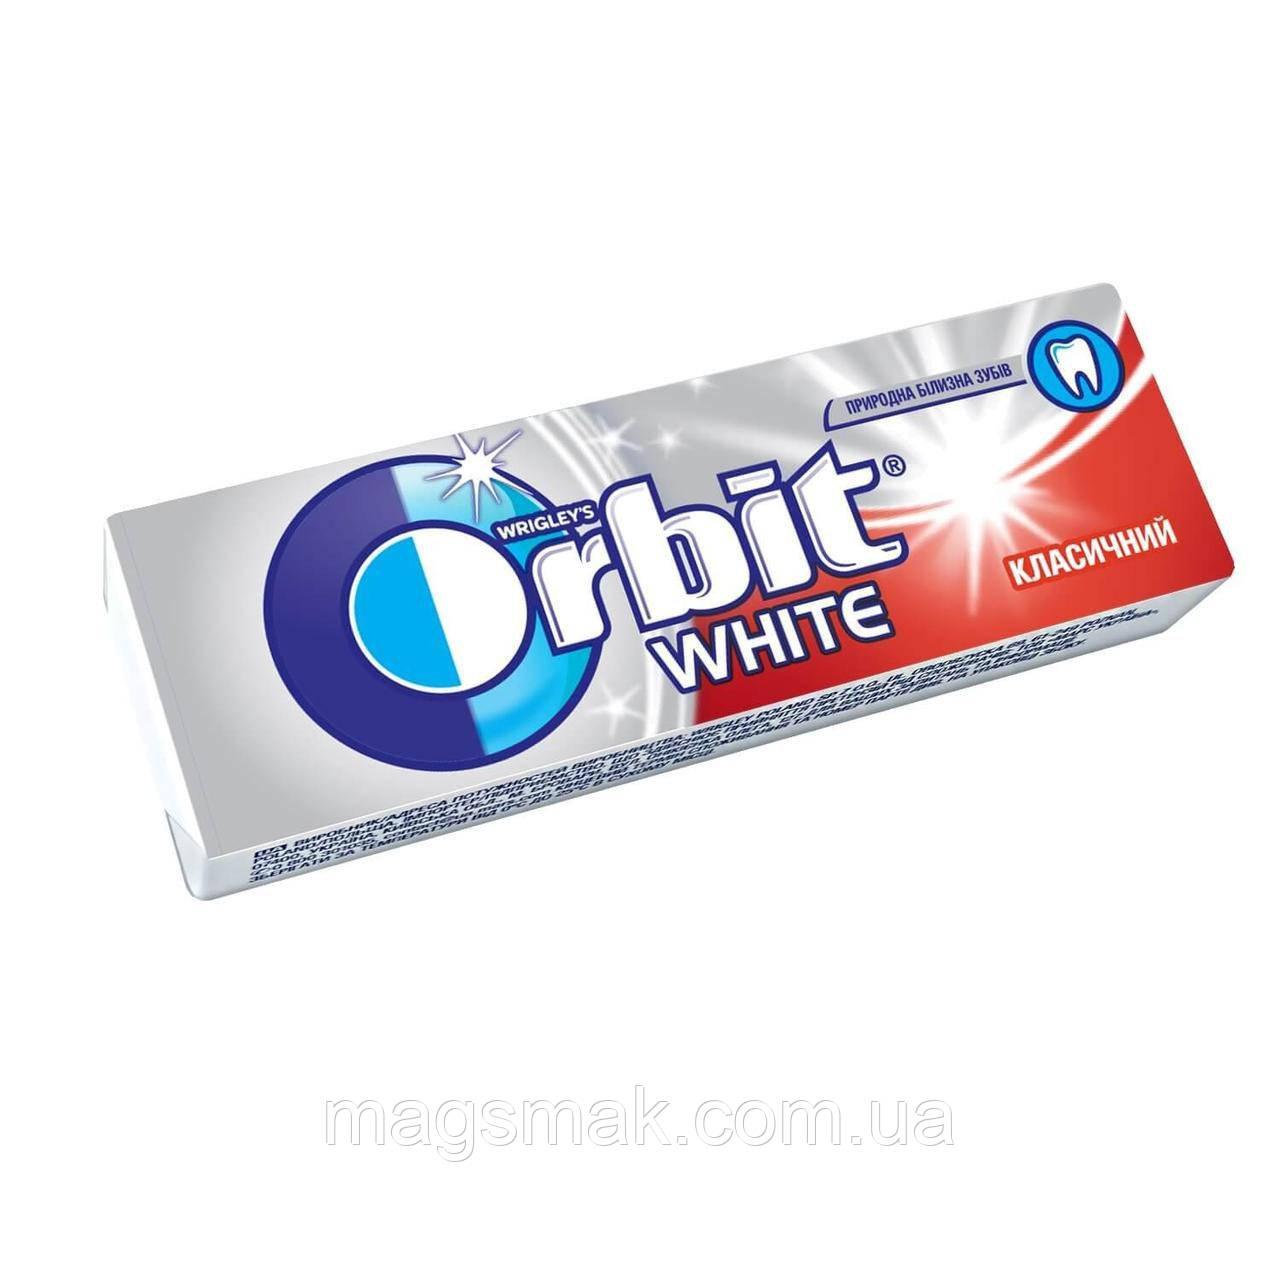 Жевательная резинка Orbit White Классический без сахара 14г